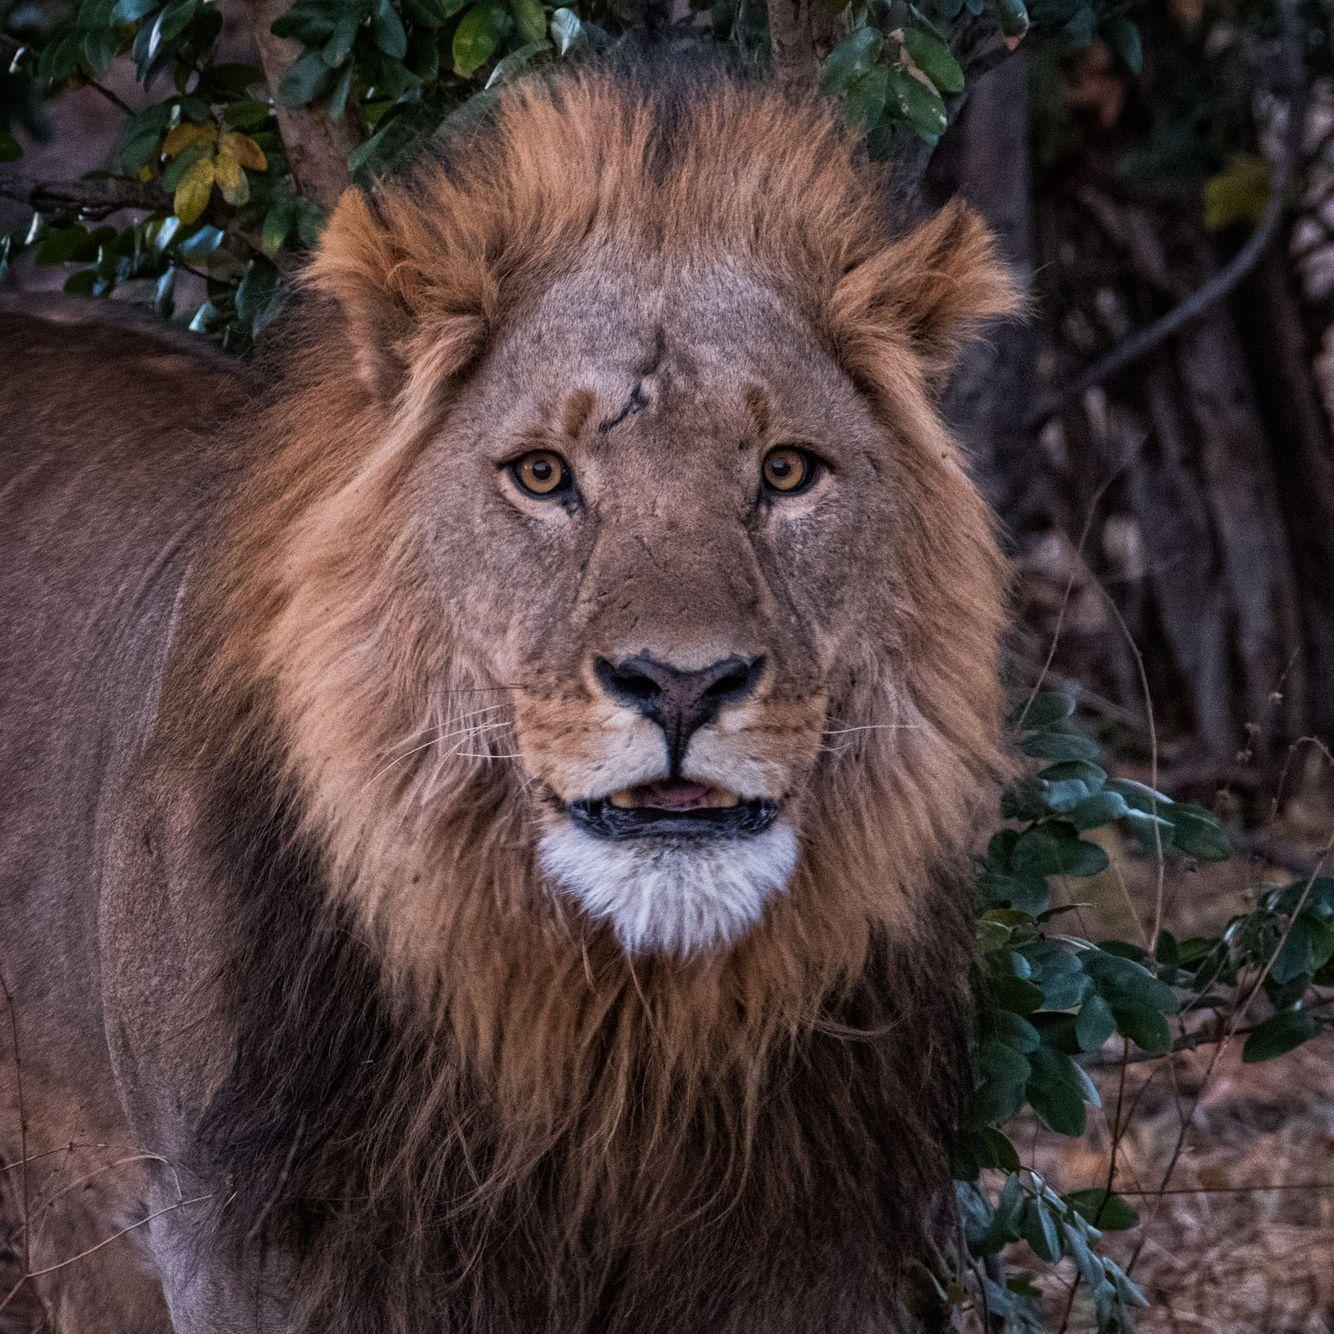 BOTSWANA:  Wildlife in the Landscape—Okavango Delta, Savute Marsh & Chobe River